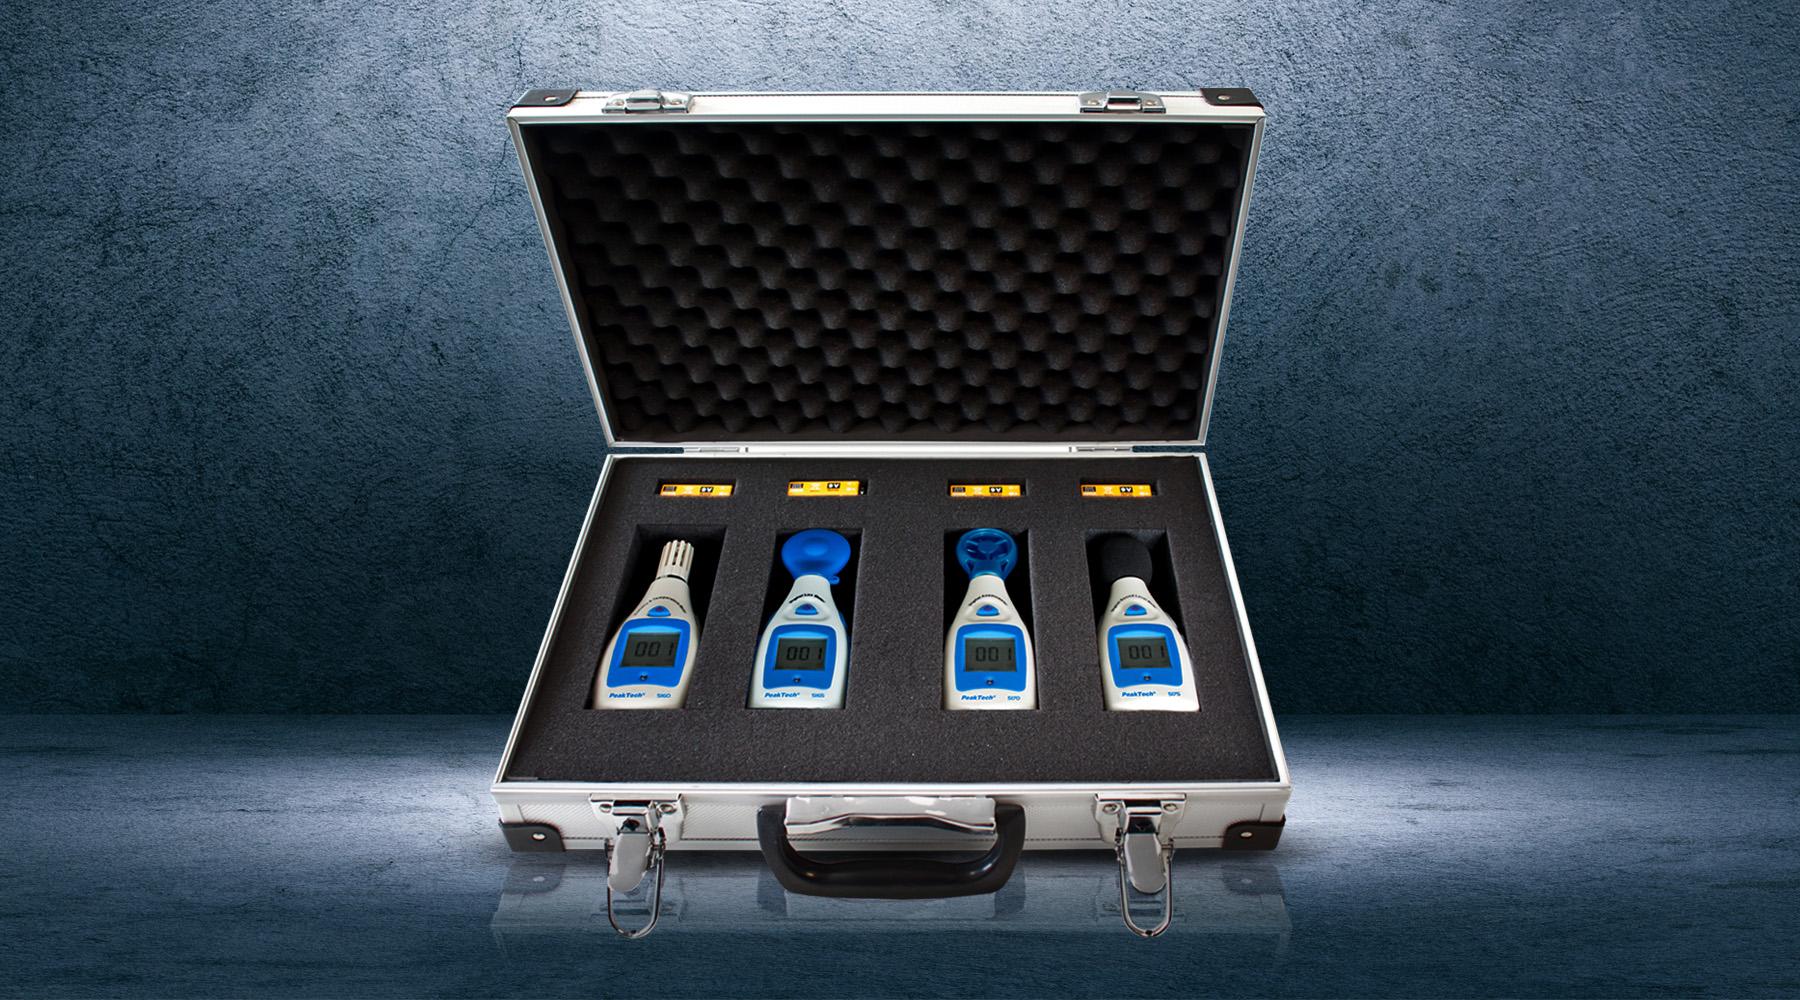 Environmental measuring devices